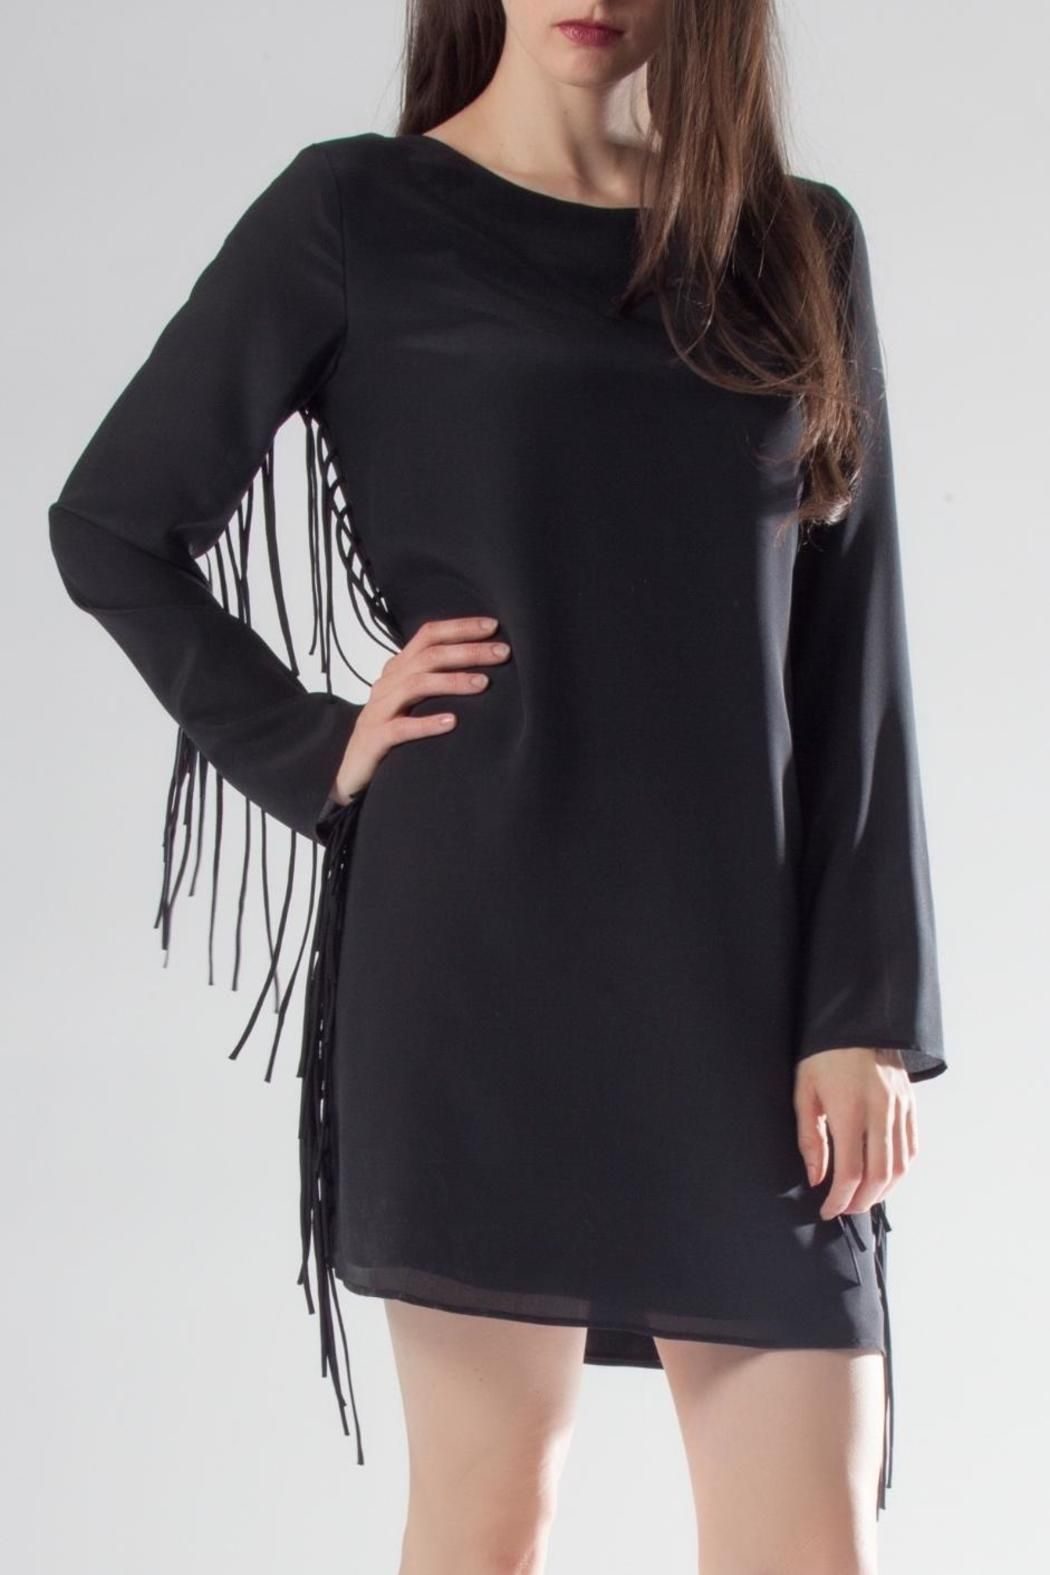 Black Silk Fringe Dress Fringe Dress Black Fringe Dress Dresses [ 1575 x 1050 Pixel ]